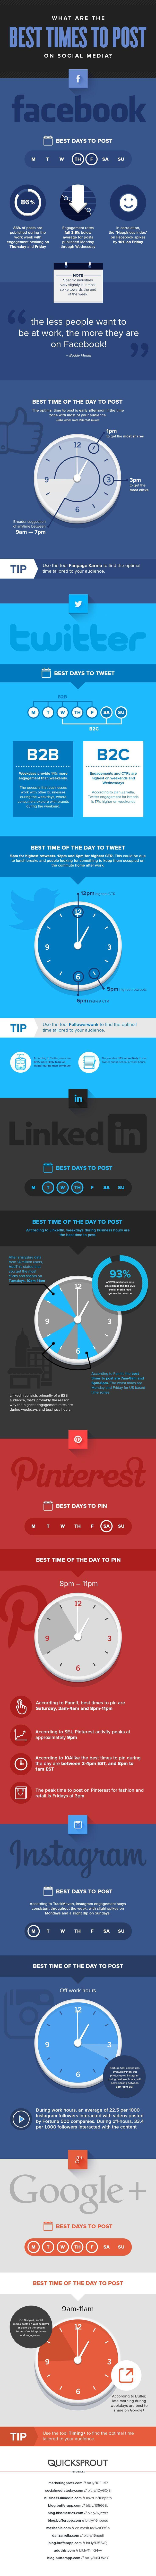 #SocialMedia #RedesSociales #Facebook #Twitter #Instagram #Youtube #Pinterest